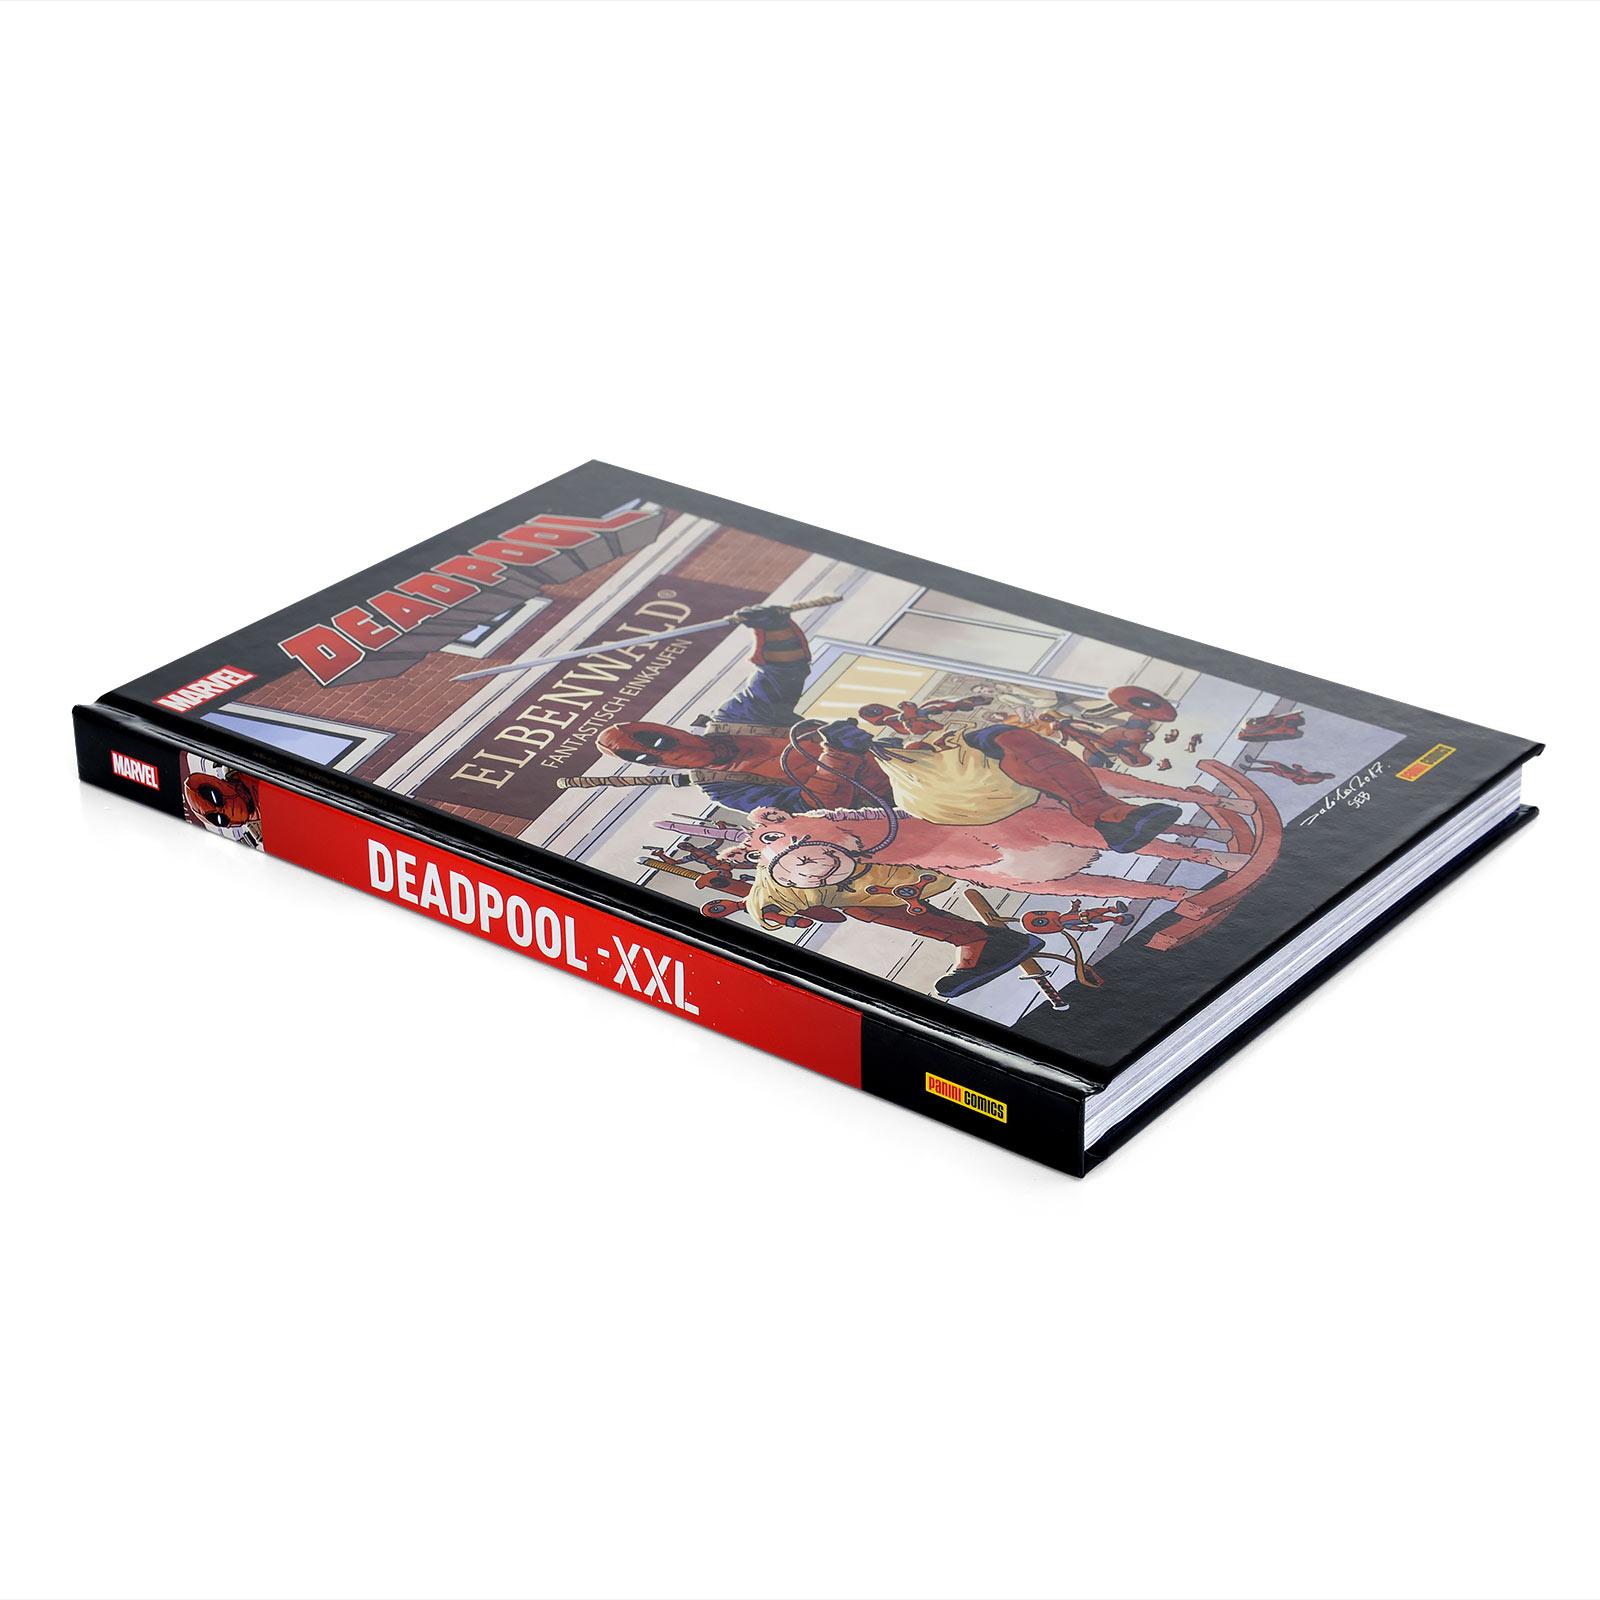 Deadpool XXL - Elbenwald Edition